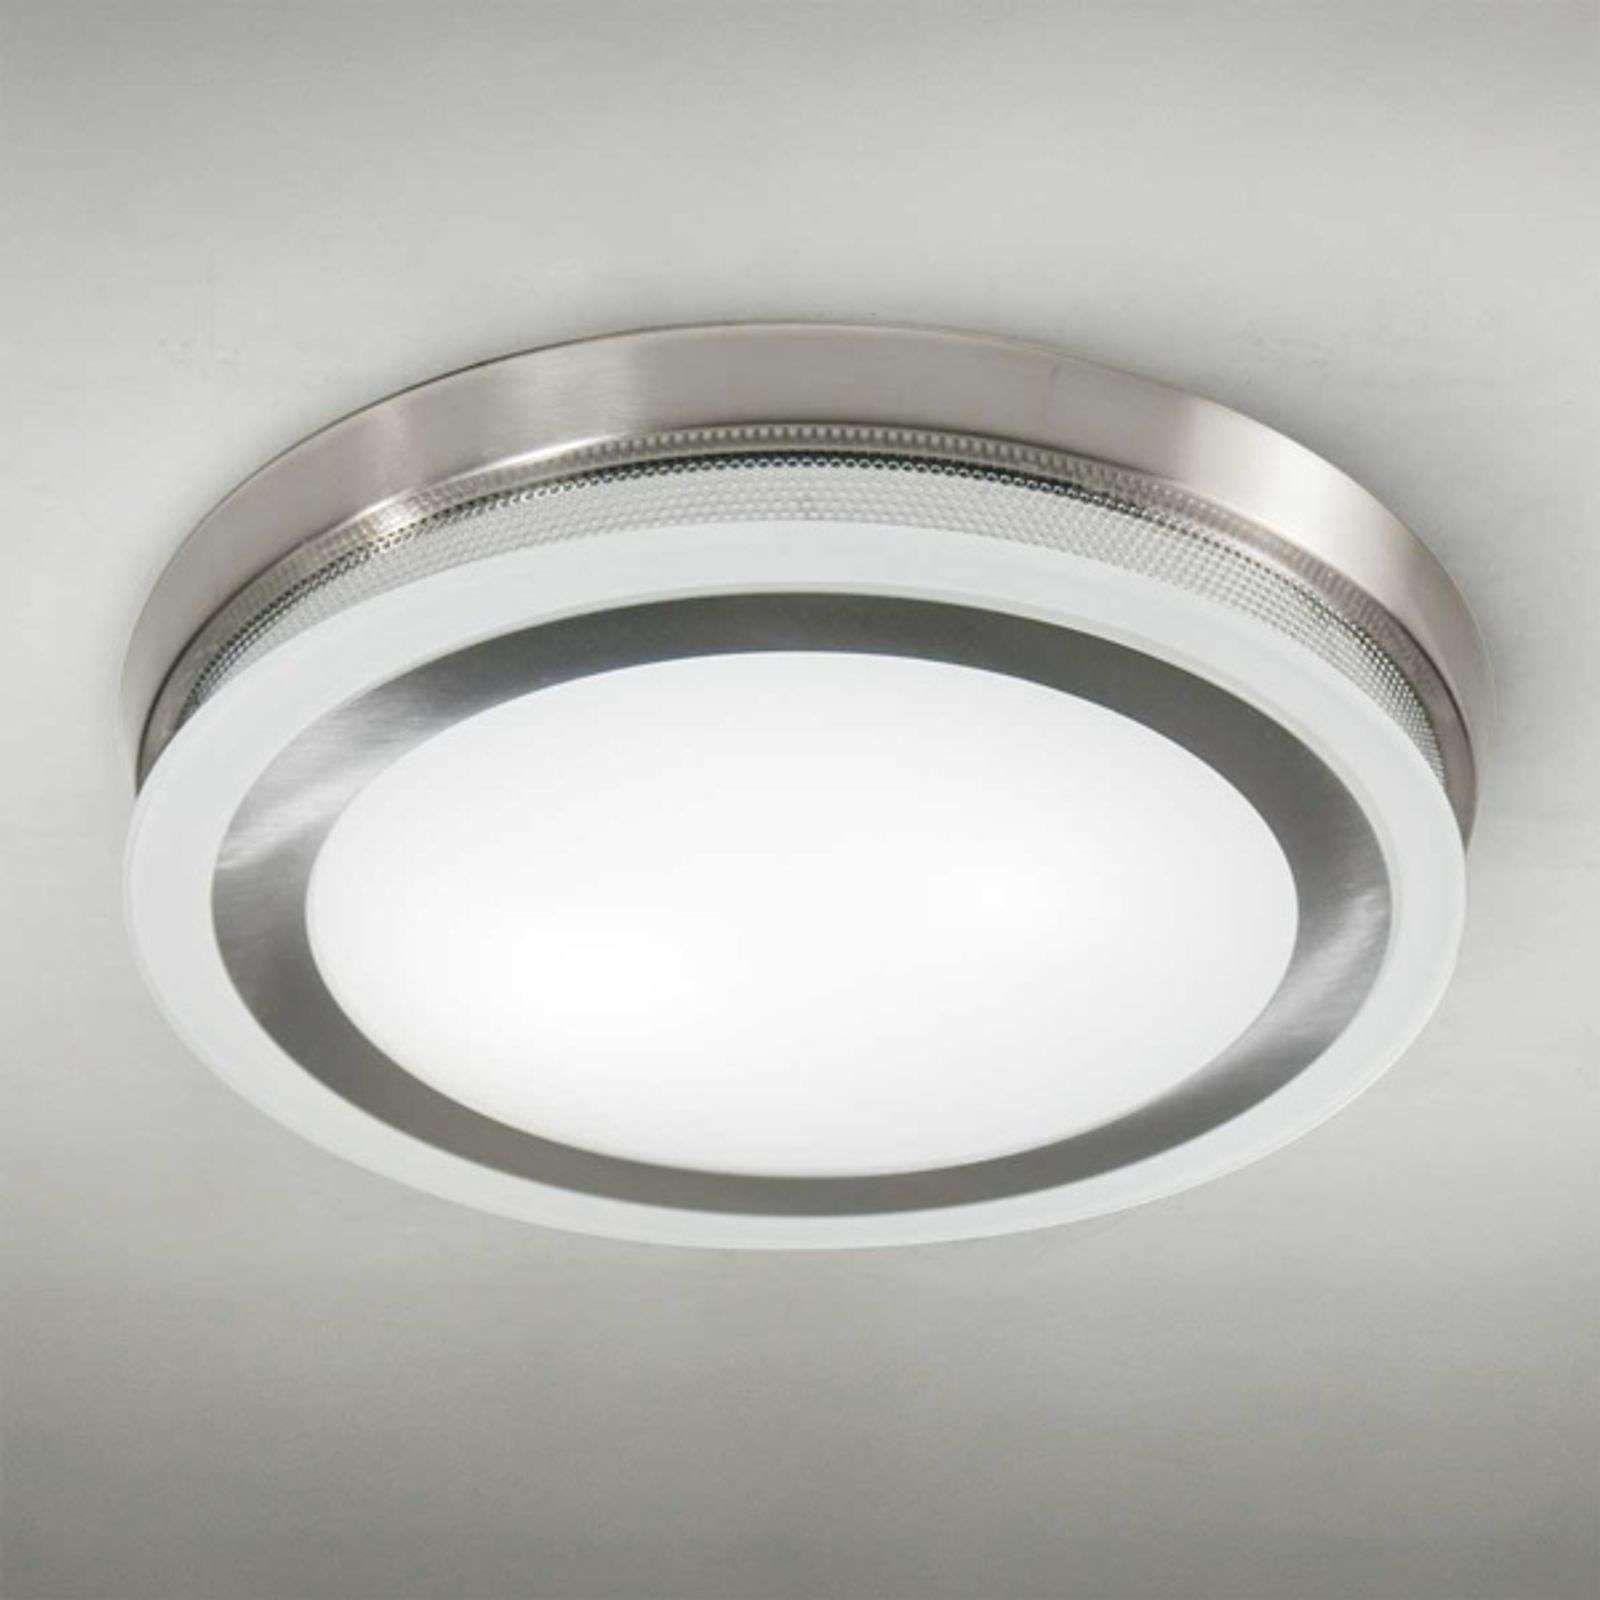 Ronde Plafondlamp Ring 9115 51 Cm Chroom Van Lam In 2020 Plafondlamp Plafondverlichting Lampen Plafond